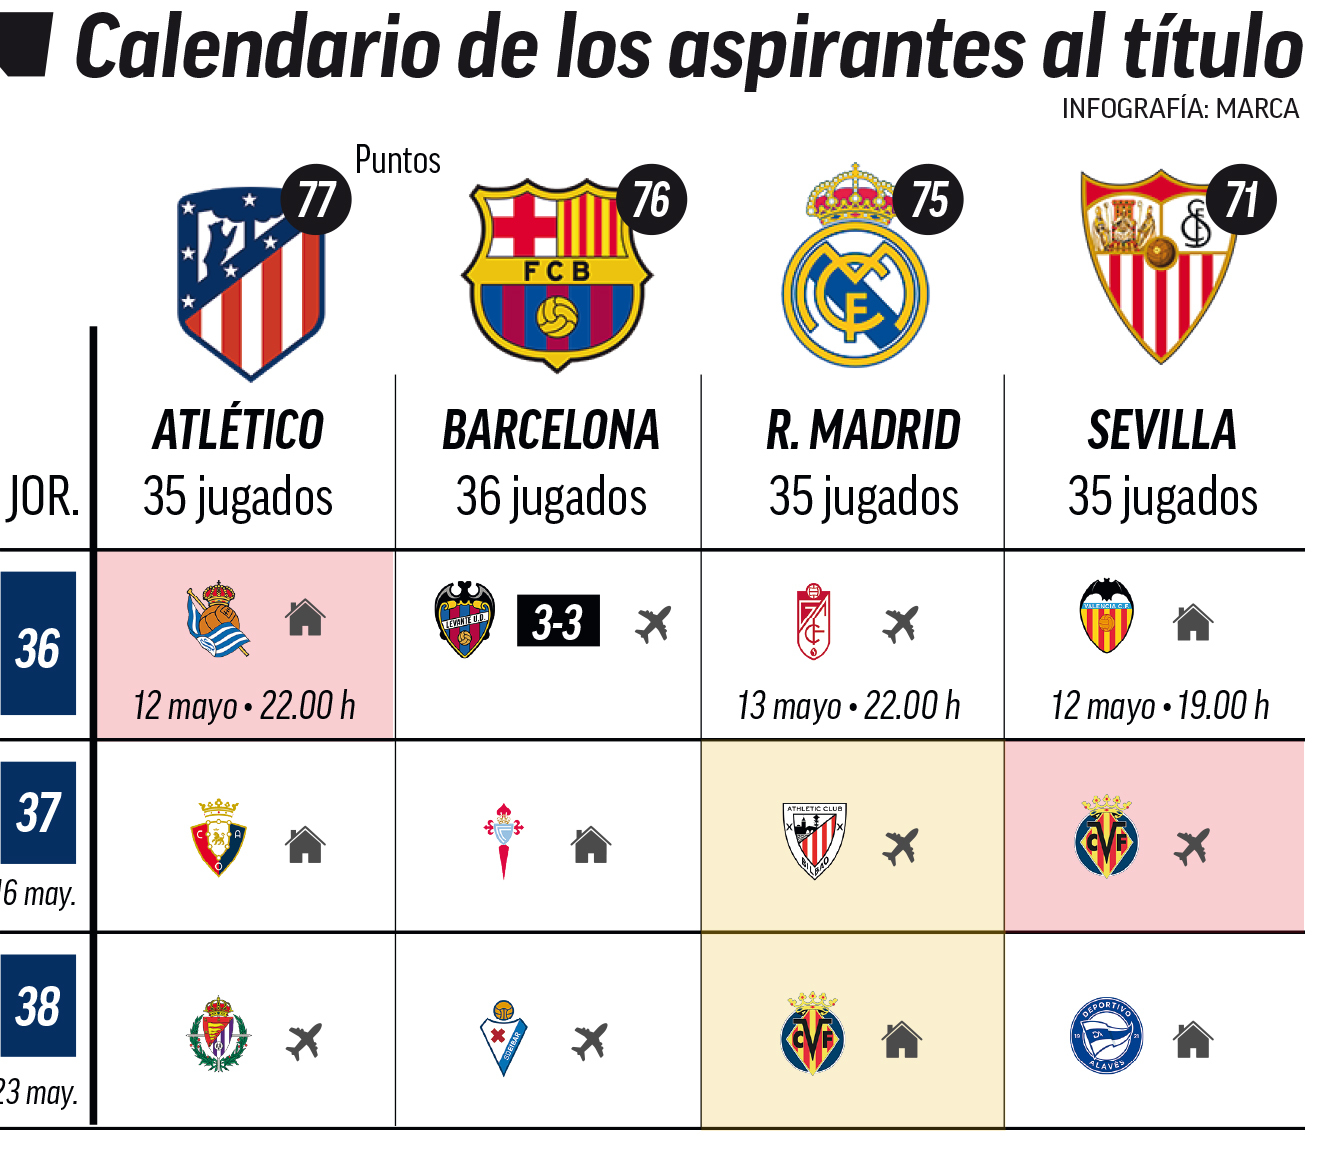 Calendario Clasificacion Atletico Barcelona Real Madrid Sevilla